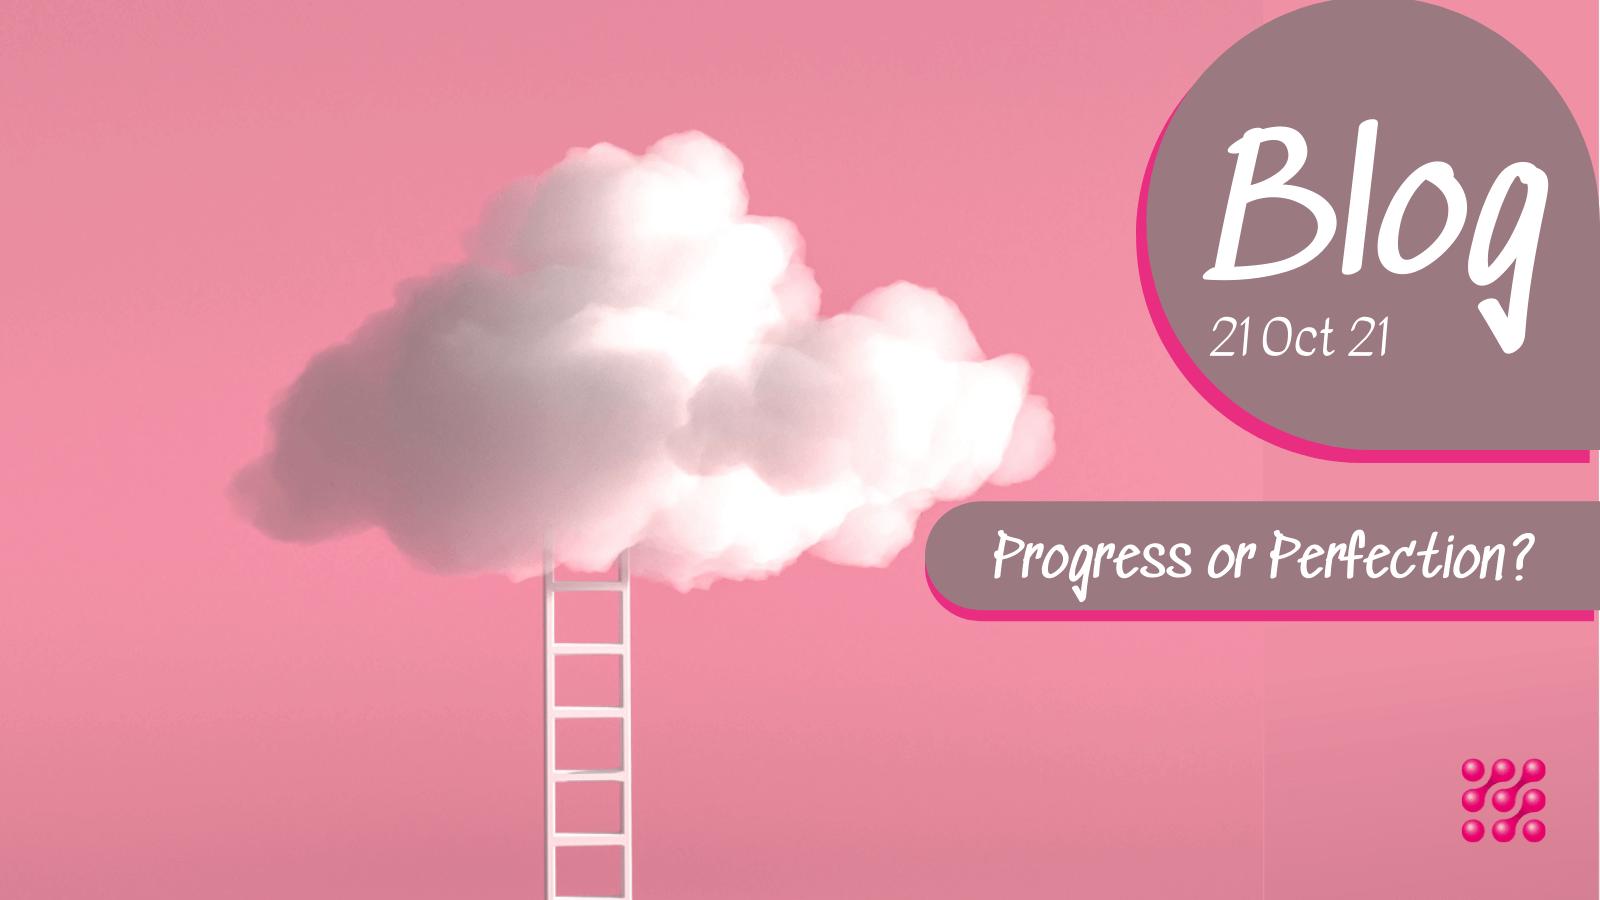 Progress or Perfection?